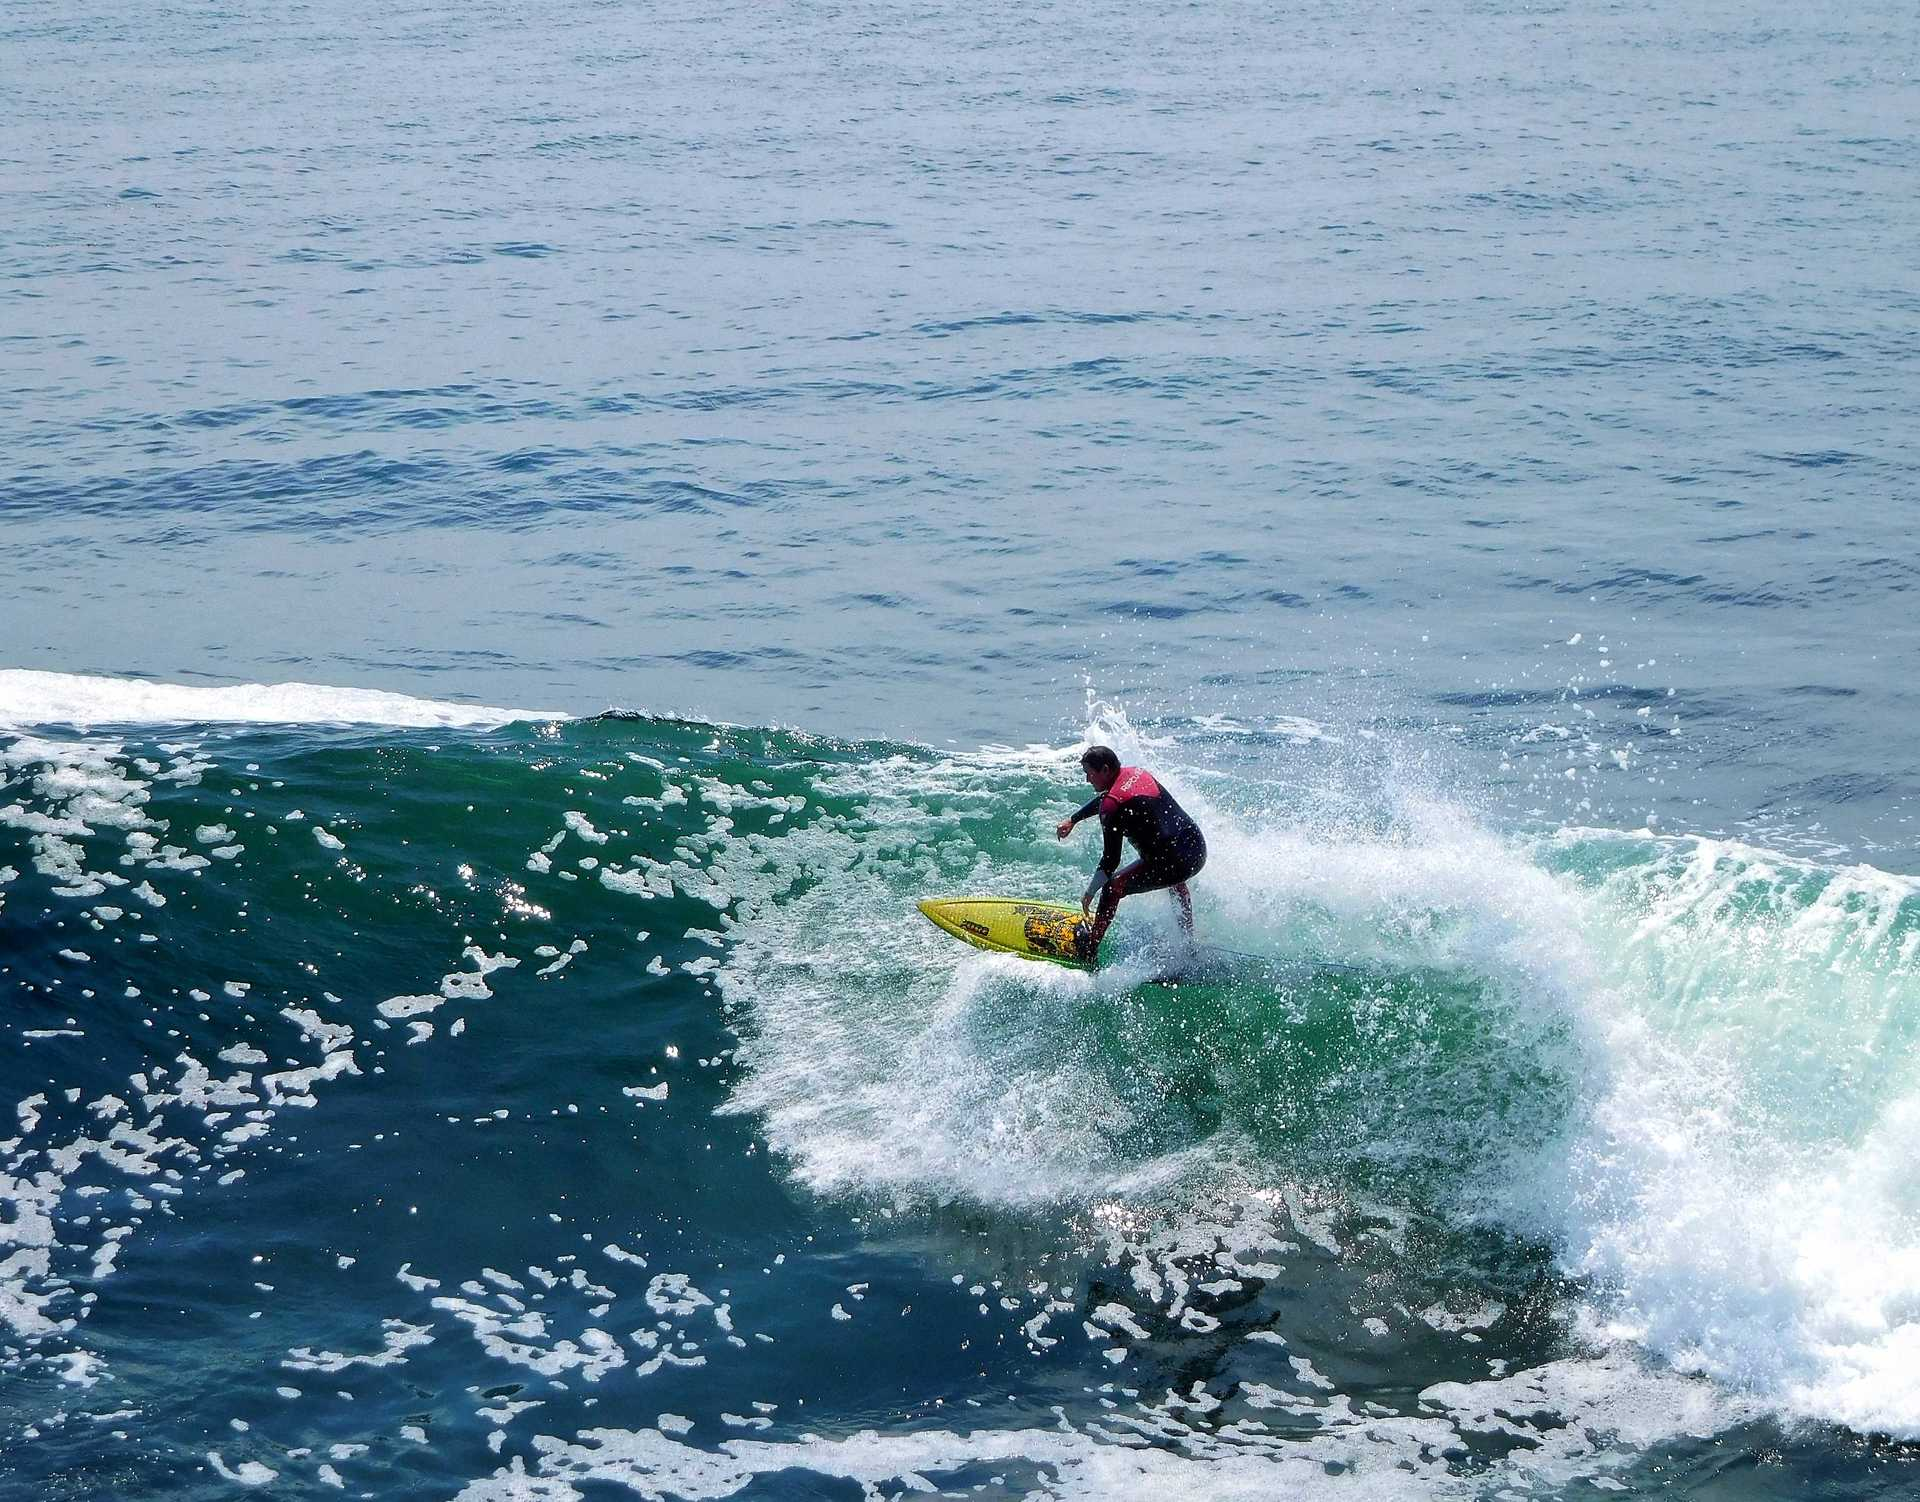 Santa Cruz surfing on a glorious day. California